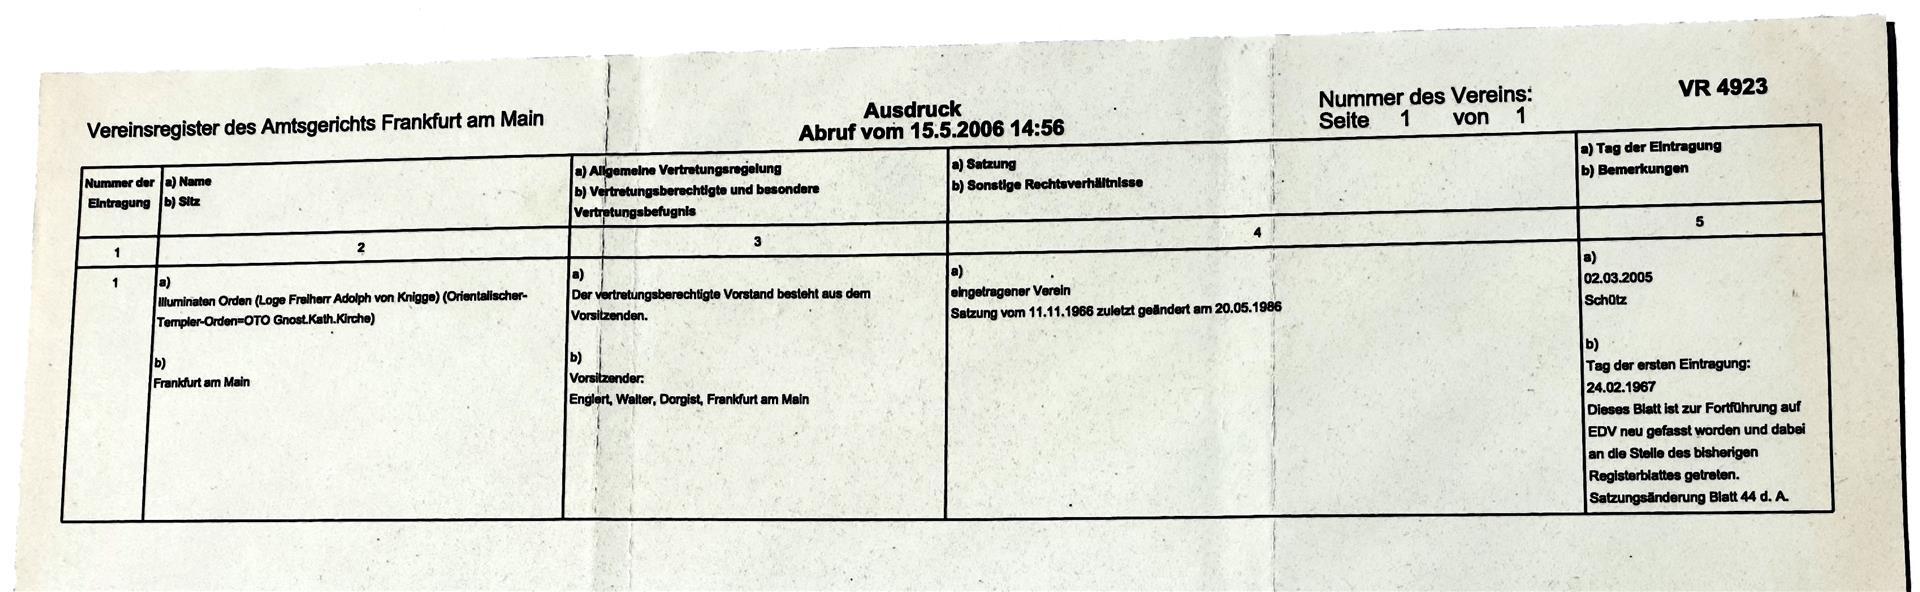 Walter Englert, Ordo Templi Orientis, Ordo Illuminatorum, legally registered